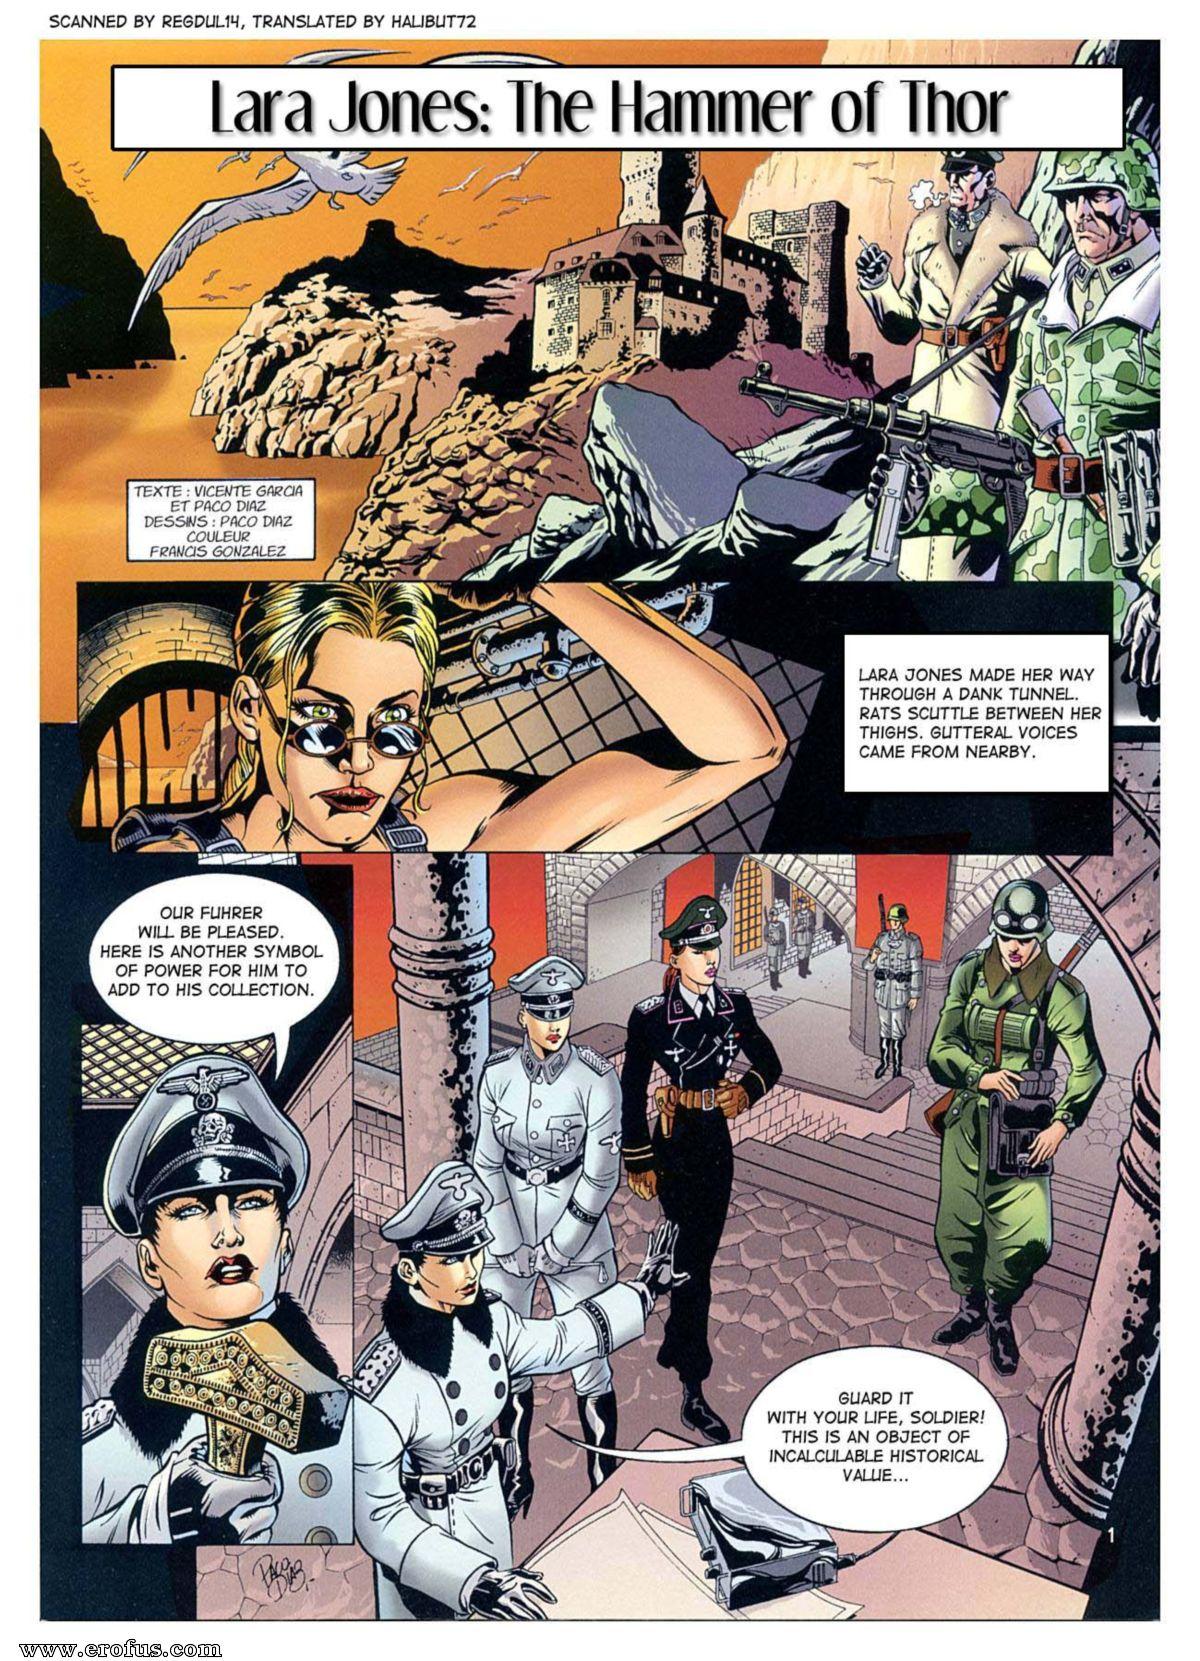 Lara jones the hammer of thor various authors cartoon